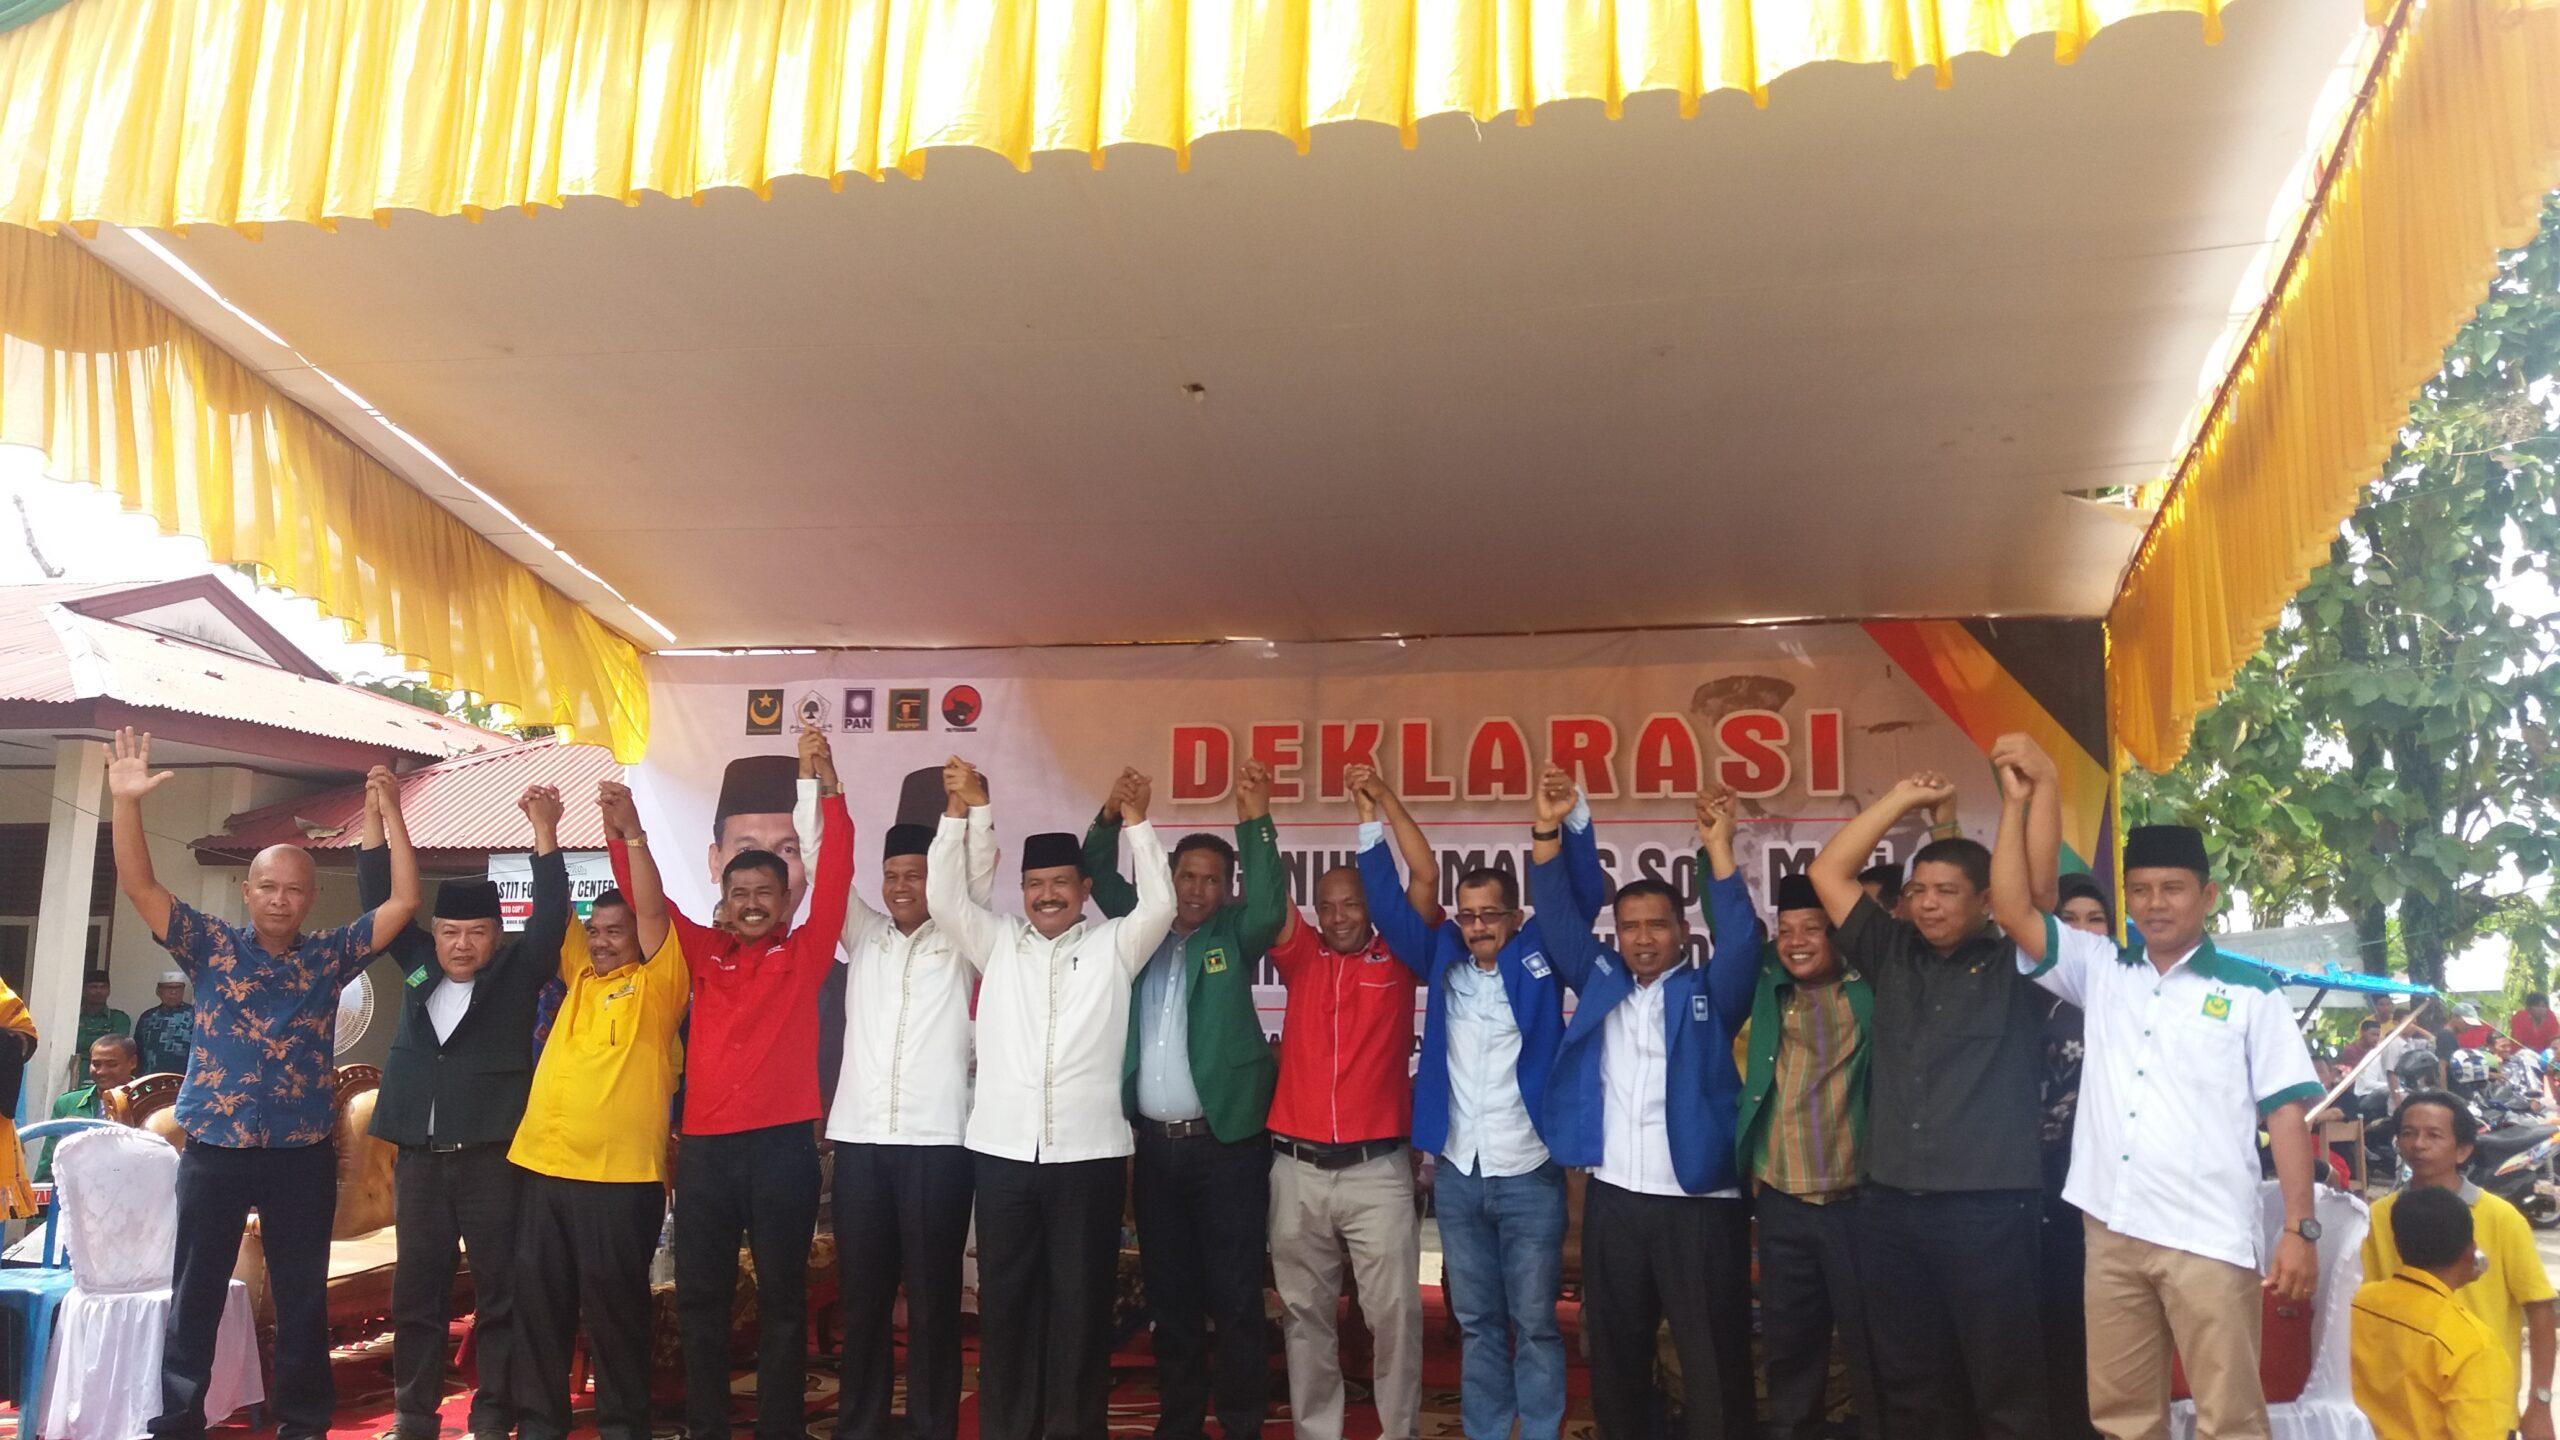 Deklarasi pasangan calon (paslon) Walikota dan Wakil Walikota pada Pemilihan Kepala Daerah (Pilkada) Kota Pariaman 2018, Genius-Maedison di halaman kampus STIT Kota Pariaman, Minggu, (8/1/2018).